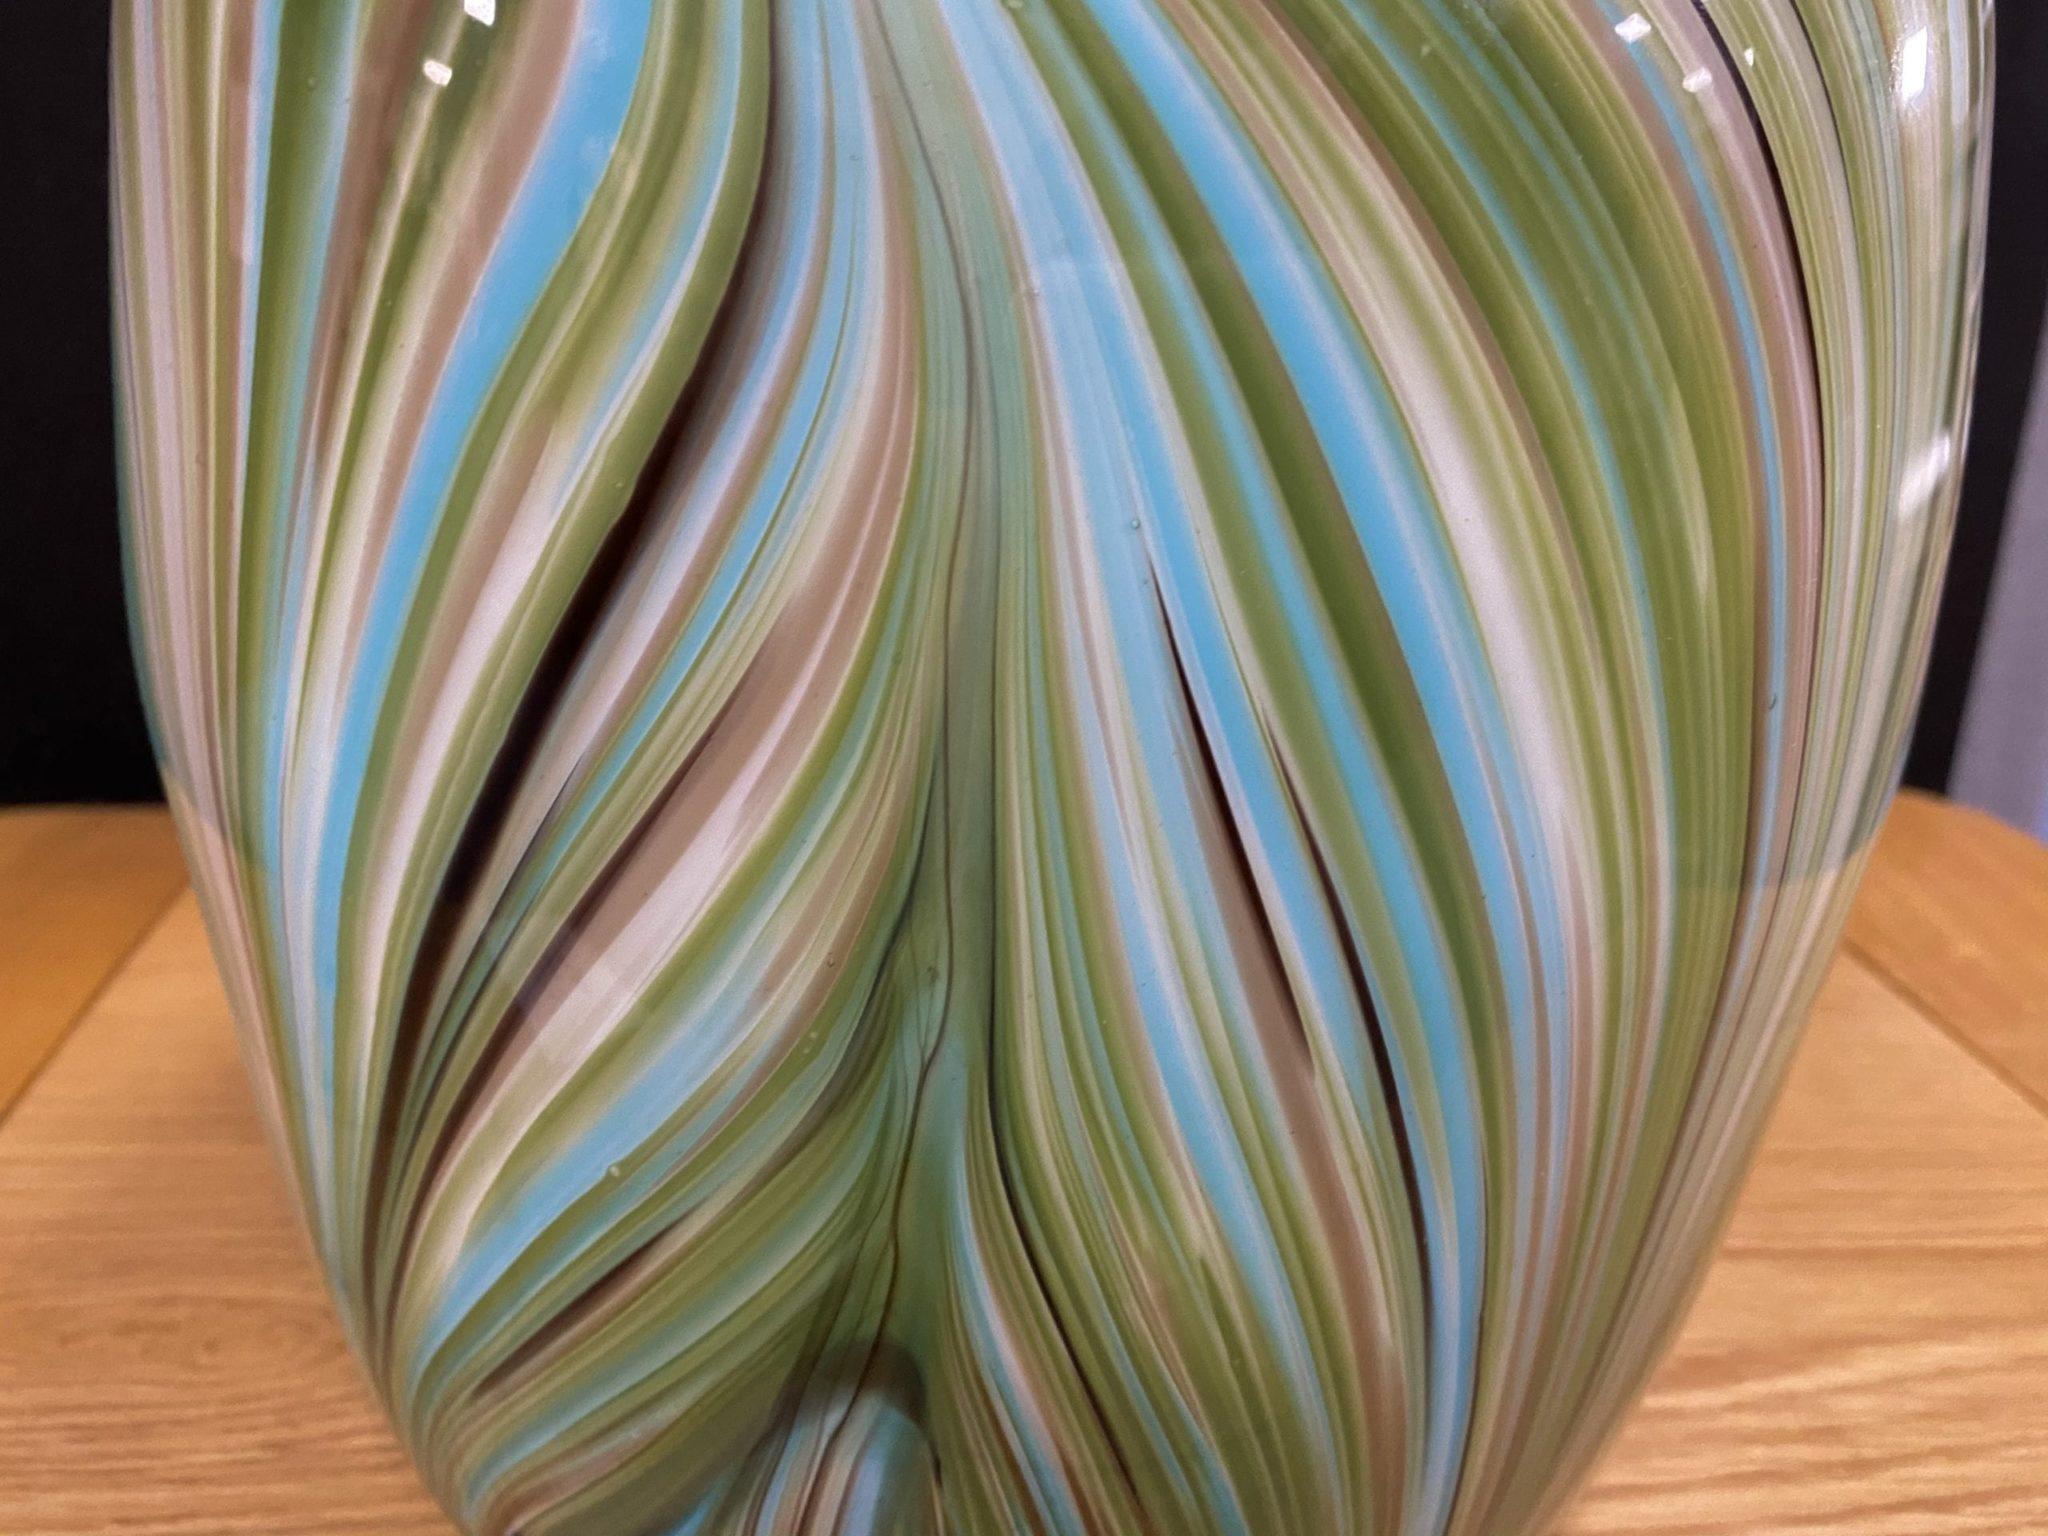 Waves of green vase close up